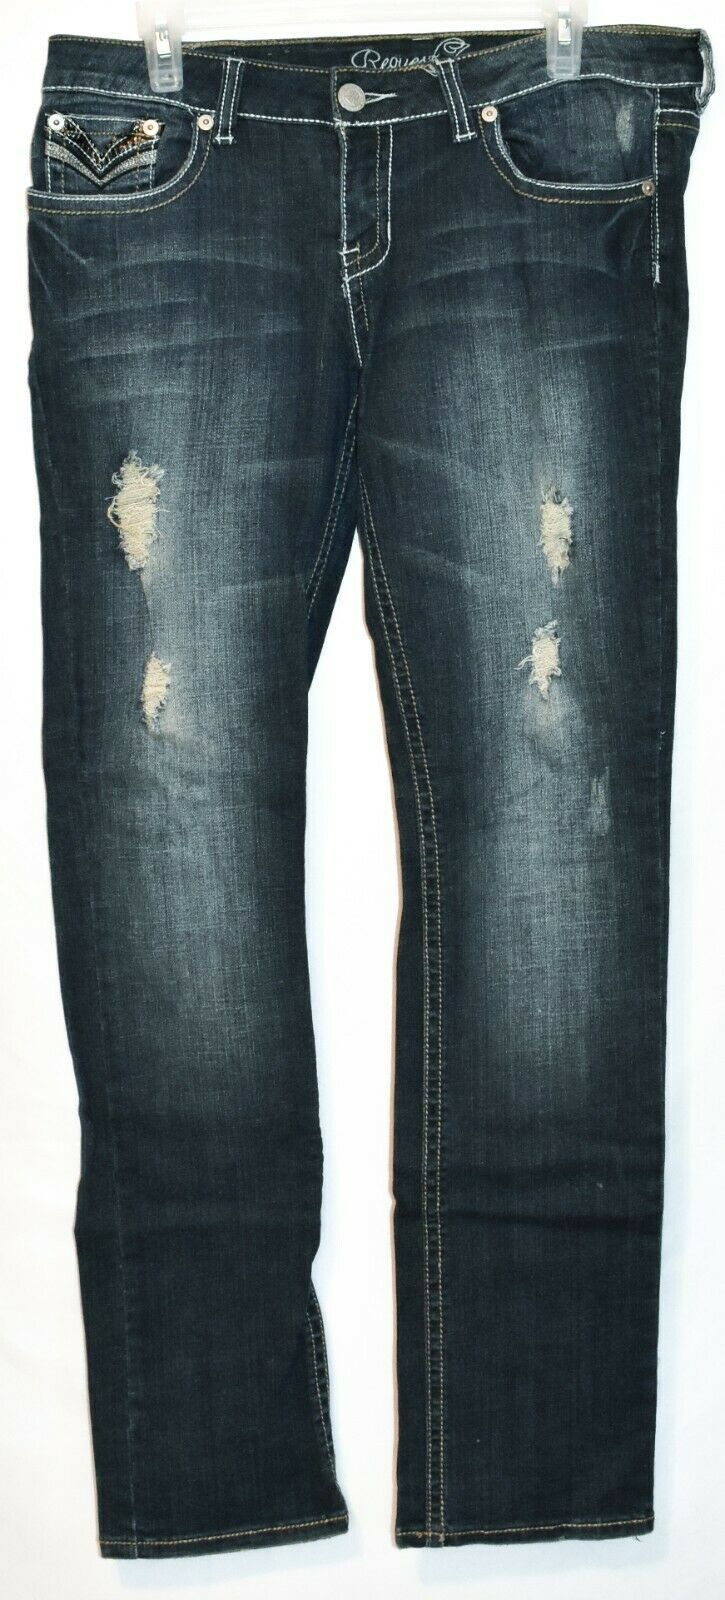 Request Women's Dark Blue Distressed Rhinestone Embellished Jeans Size 13/32